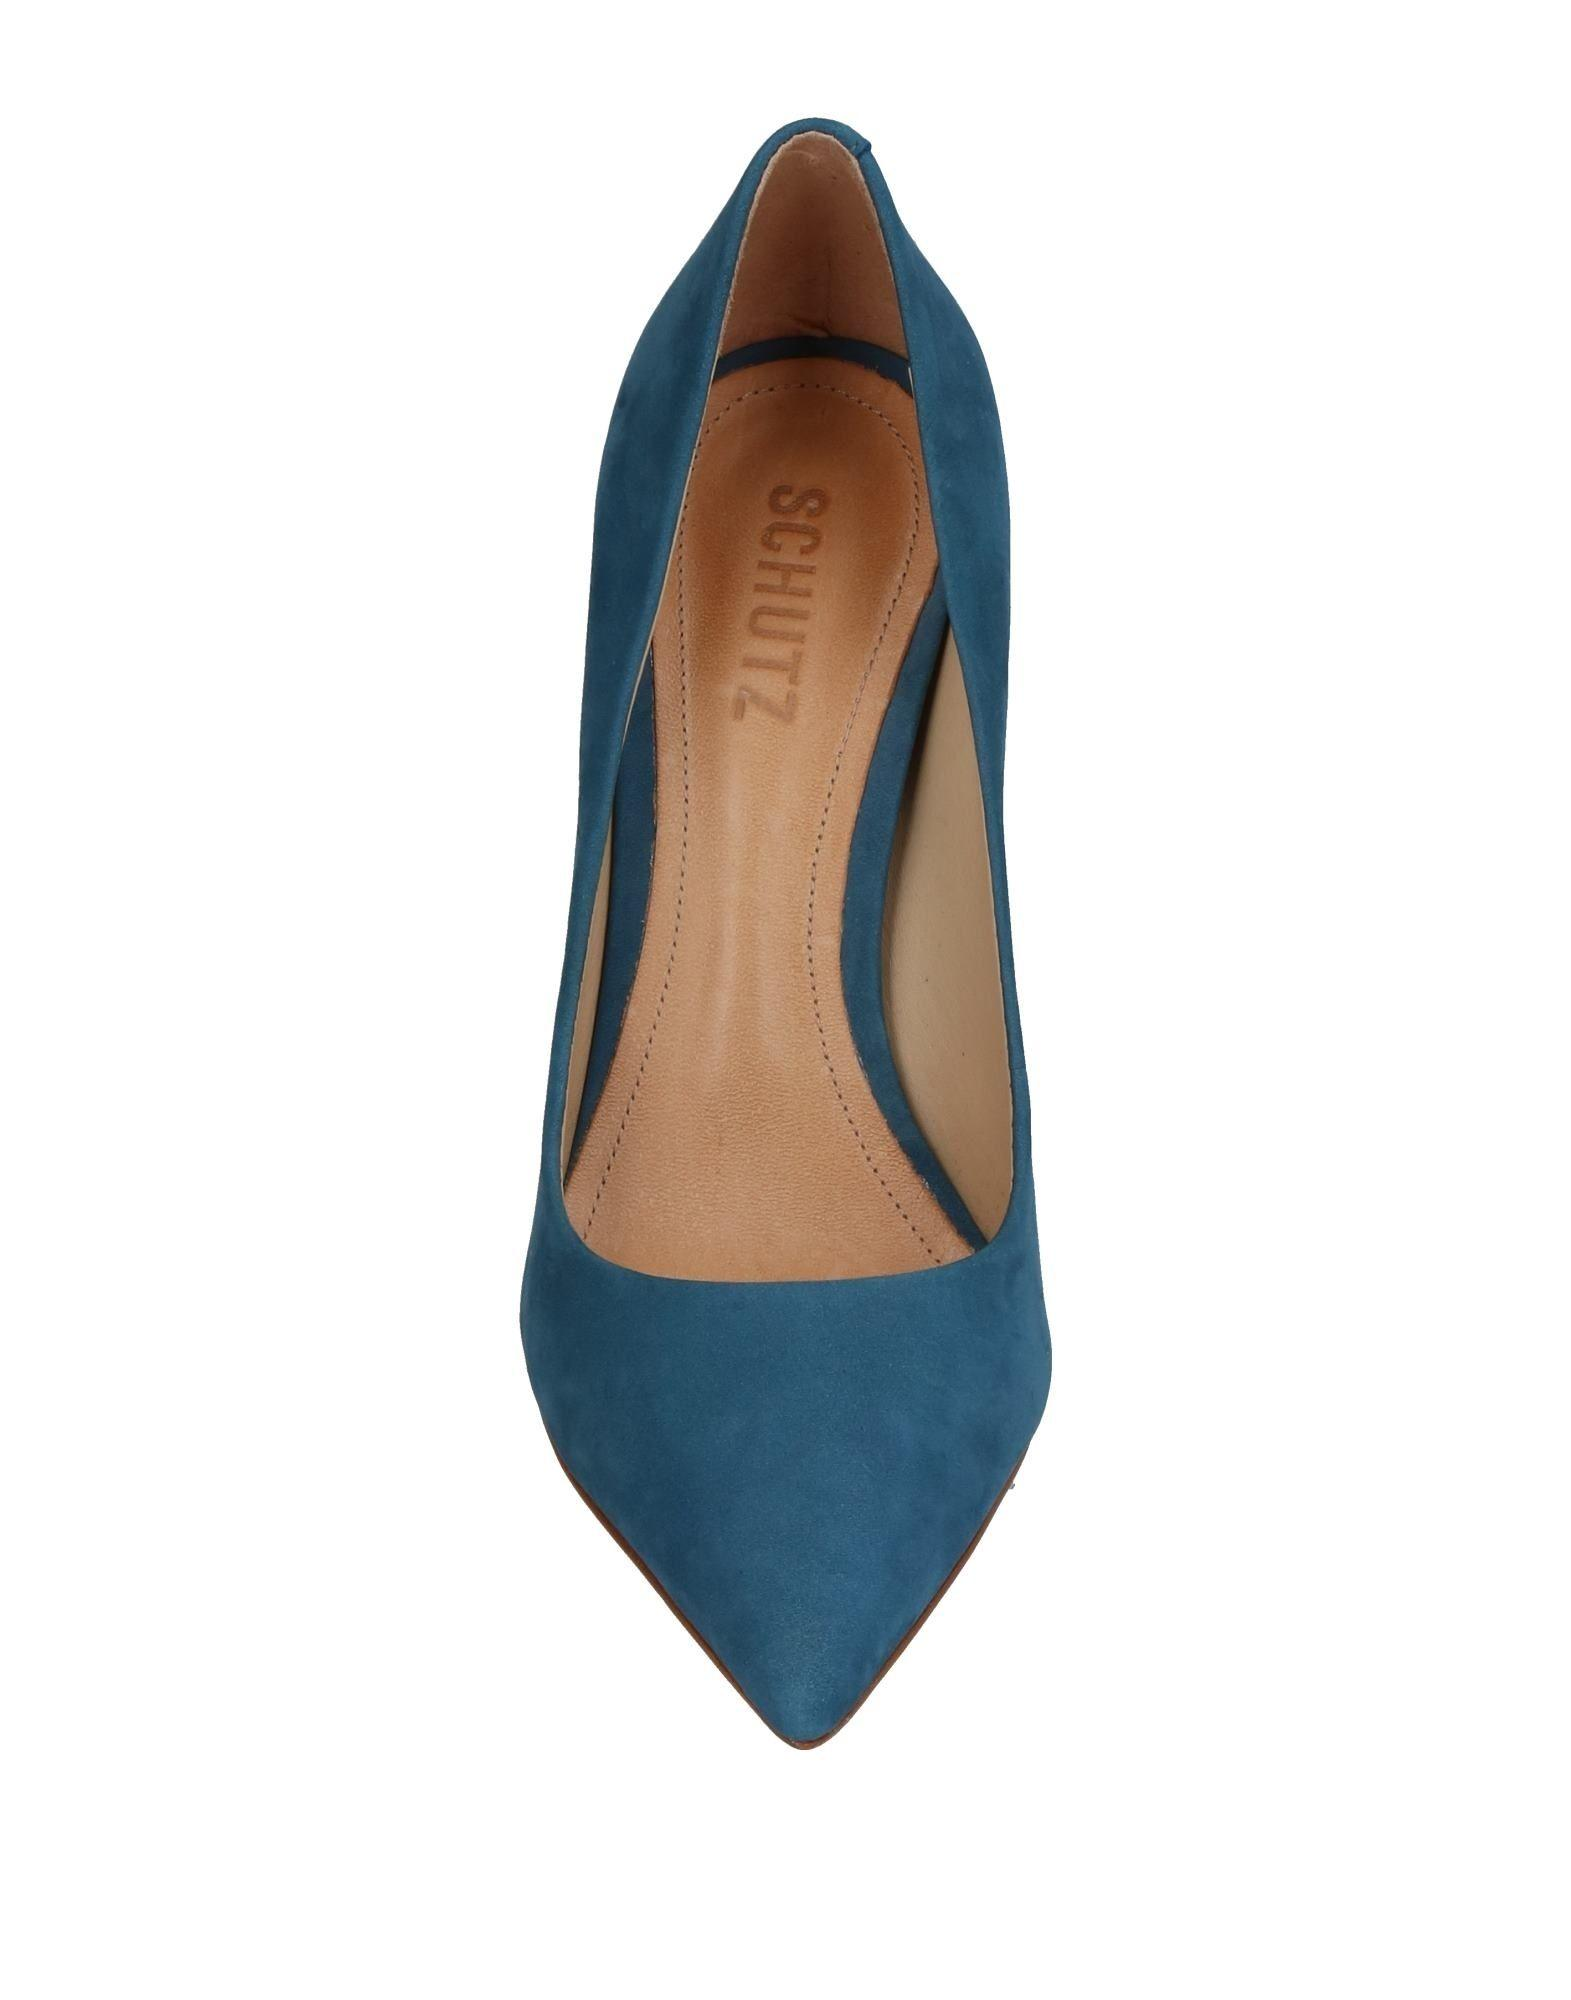 Zapatos de salón Schutz de Cuero de color Azul